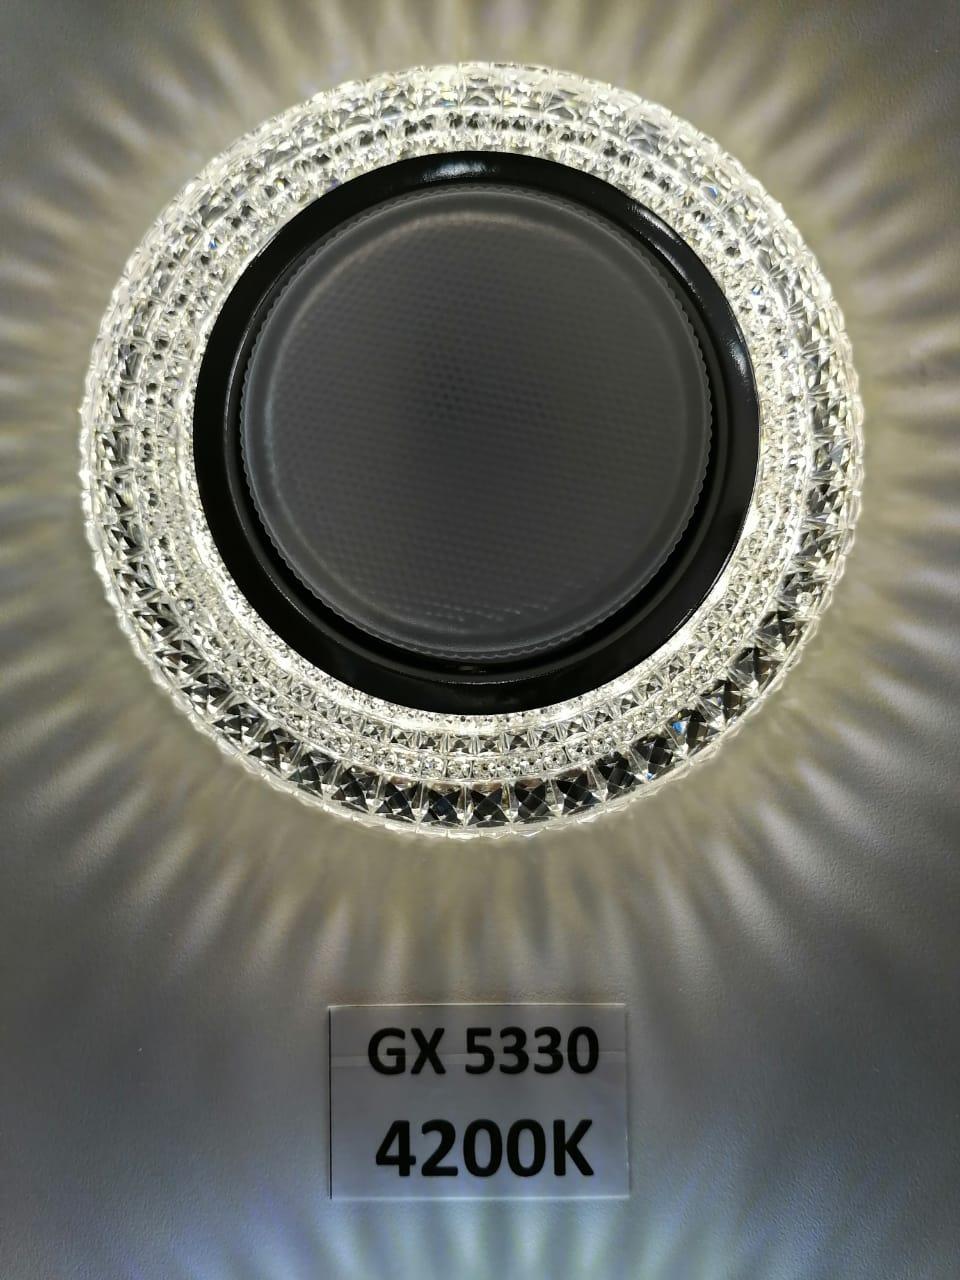 GX 5330